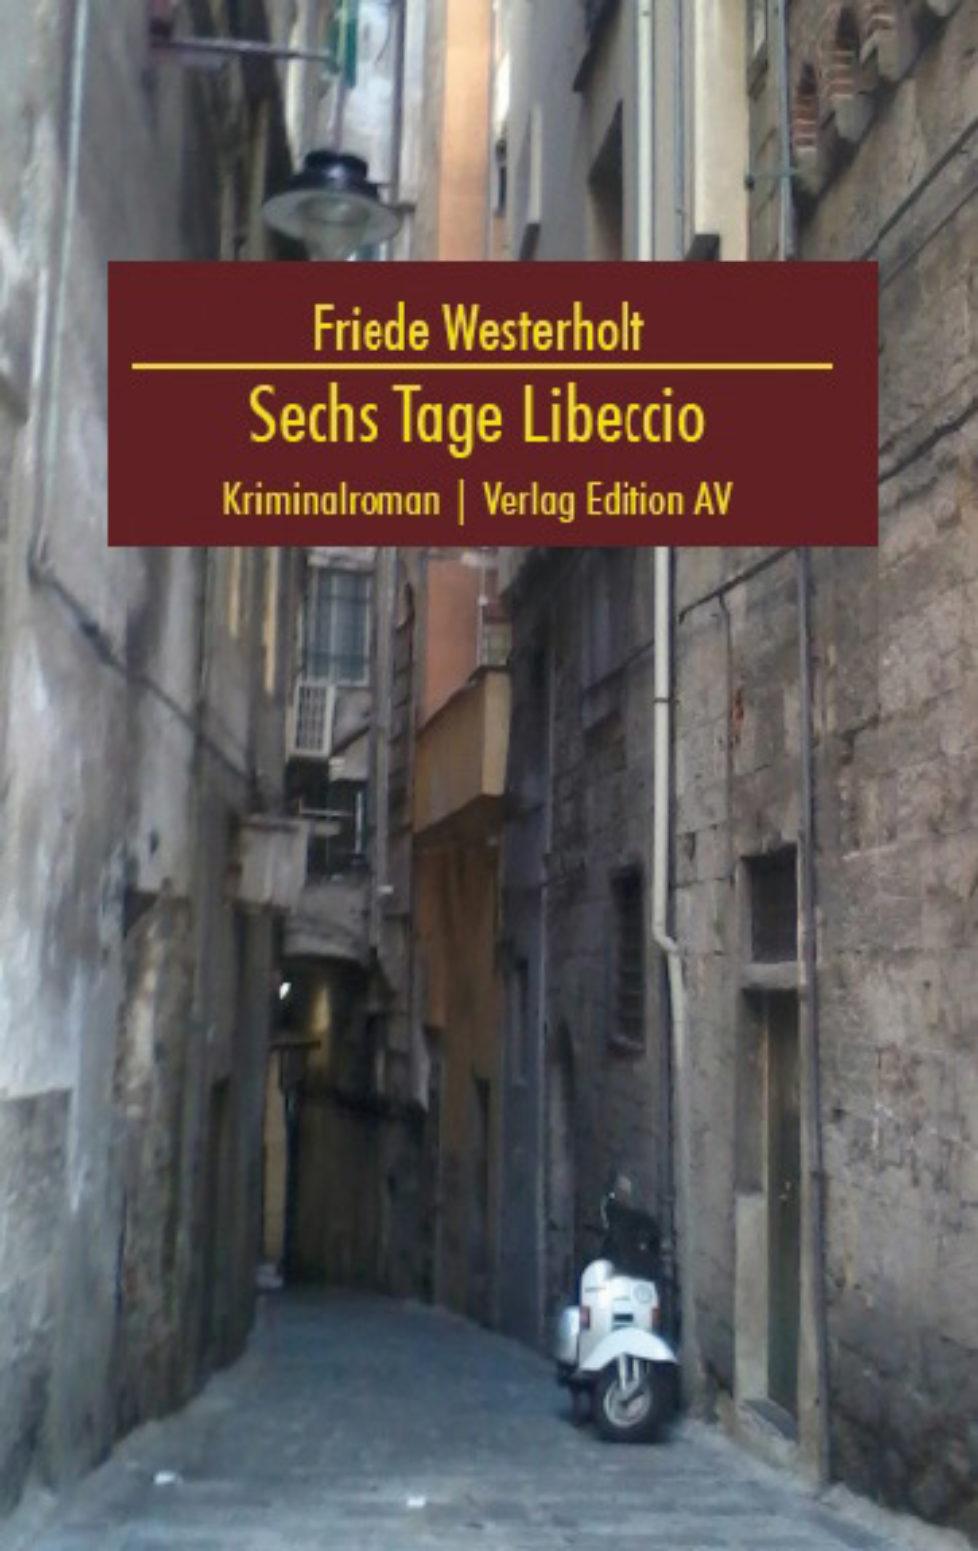 FRIEDE WESTERHOLT: SECHS TAGE LIBECCIO